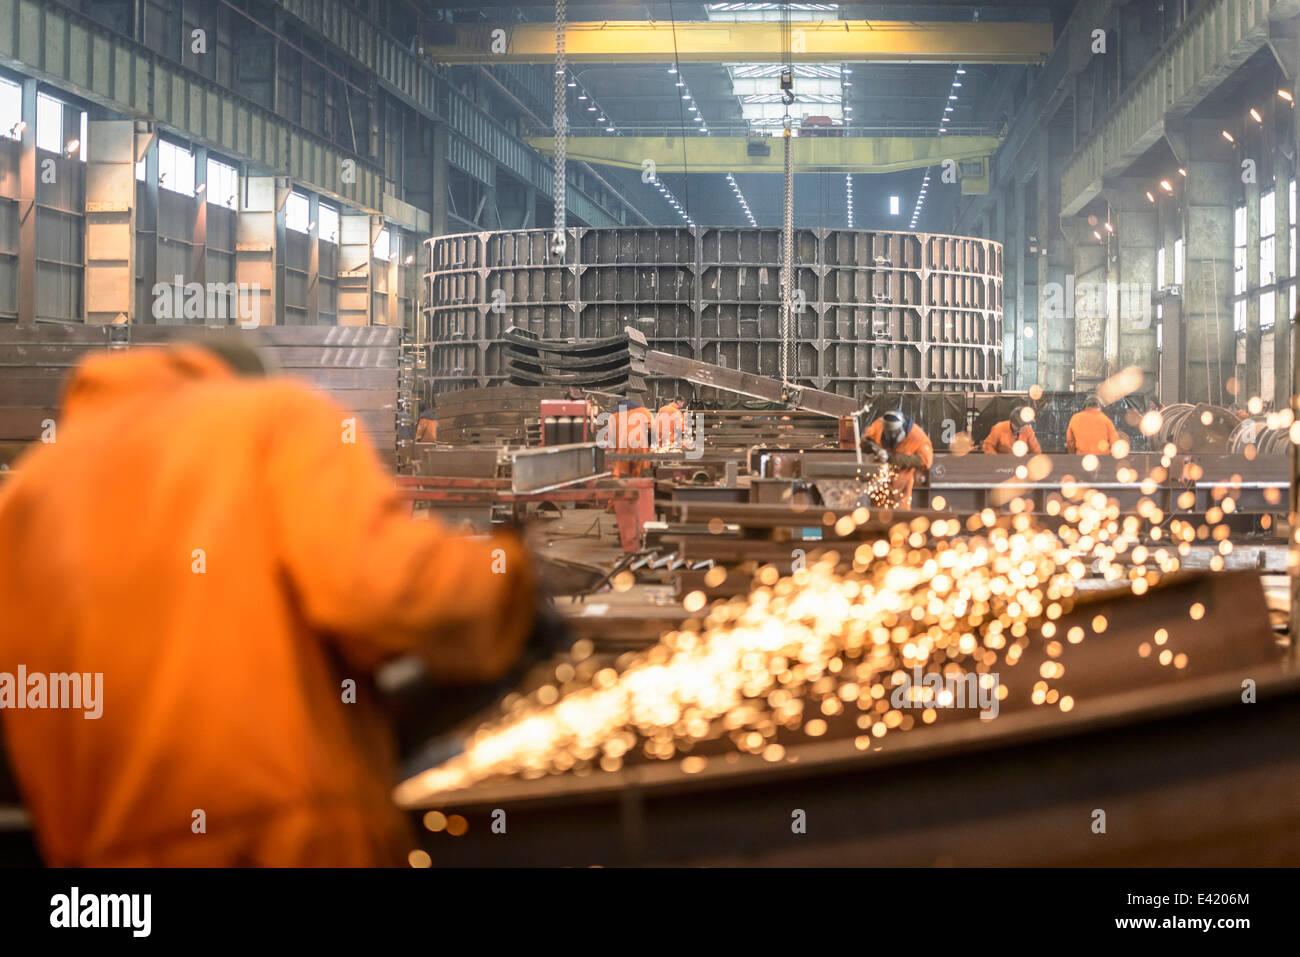 Meulage travailleur construction métallique fabrication marine factory Photo Stock